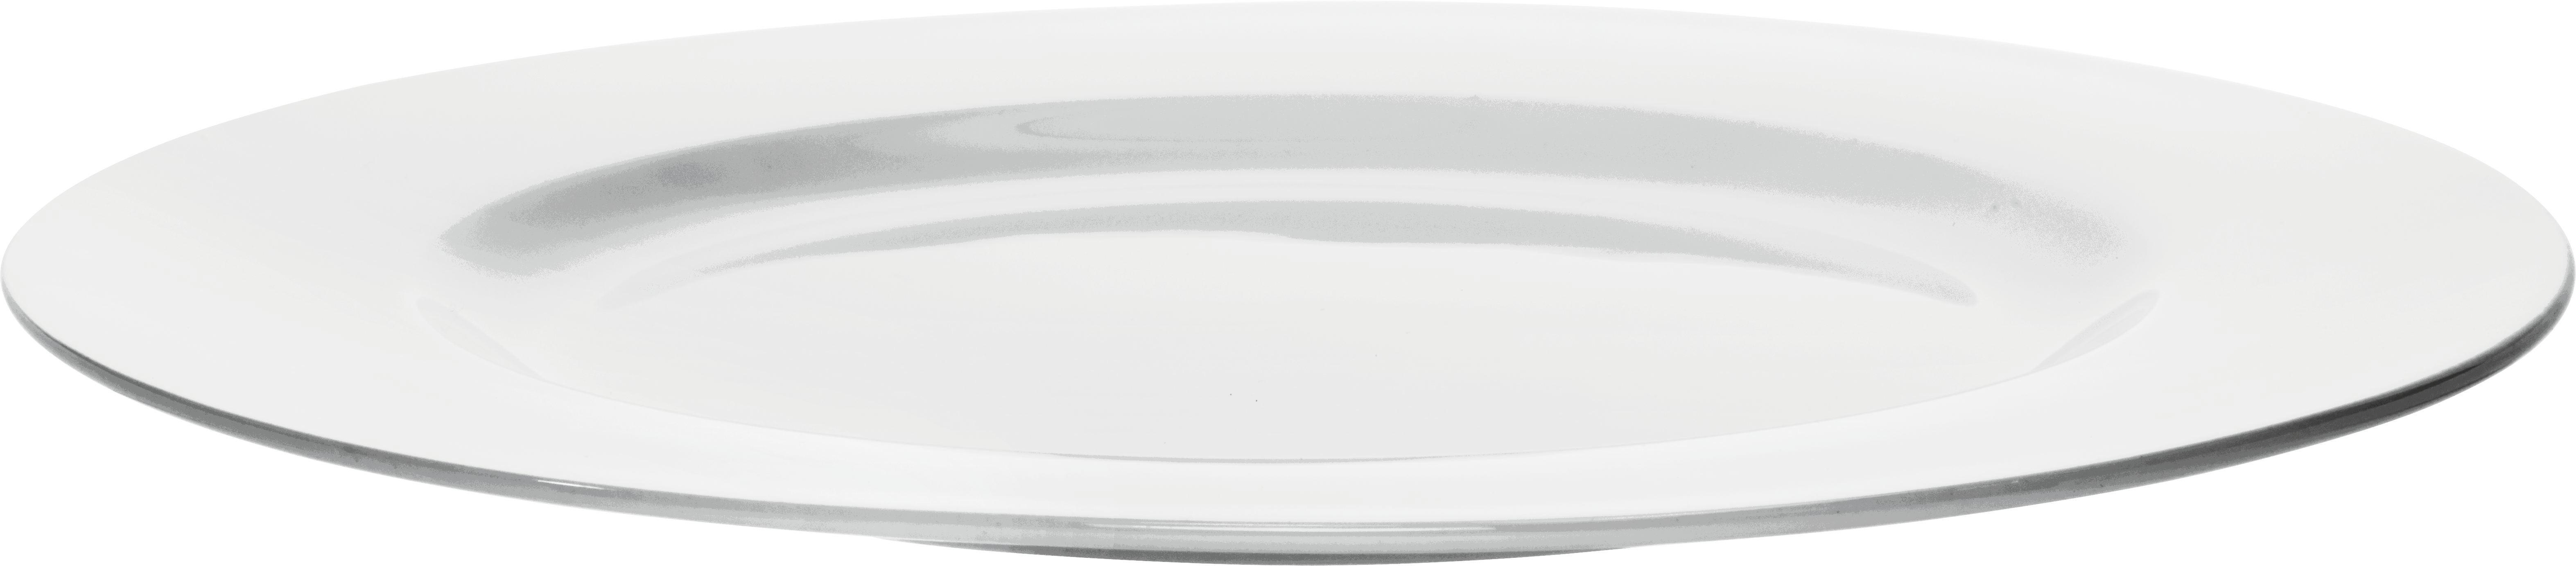 Plitvi Krožnik Bonnie - bela, Moderno, keramika (26,6cm) - MÖMAX modern living